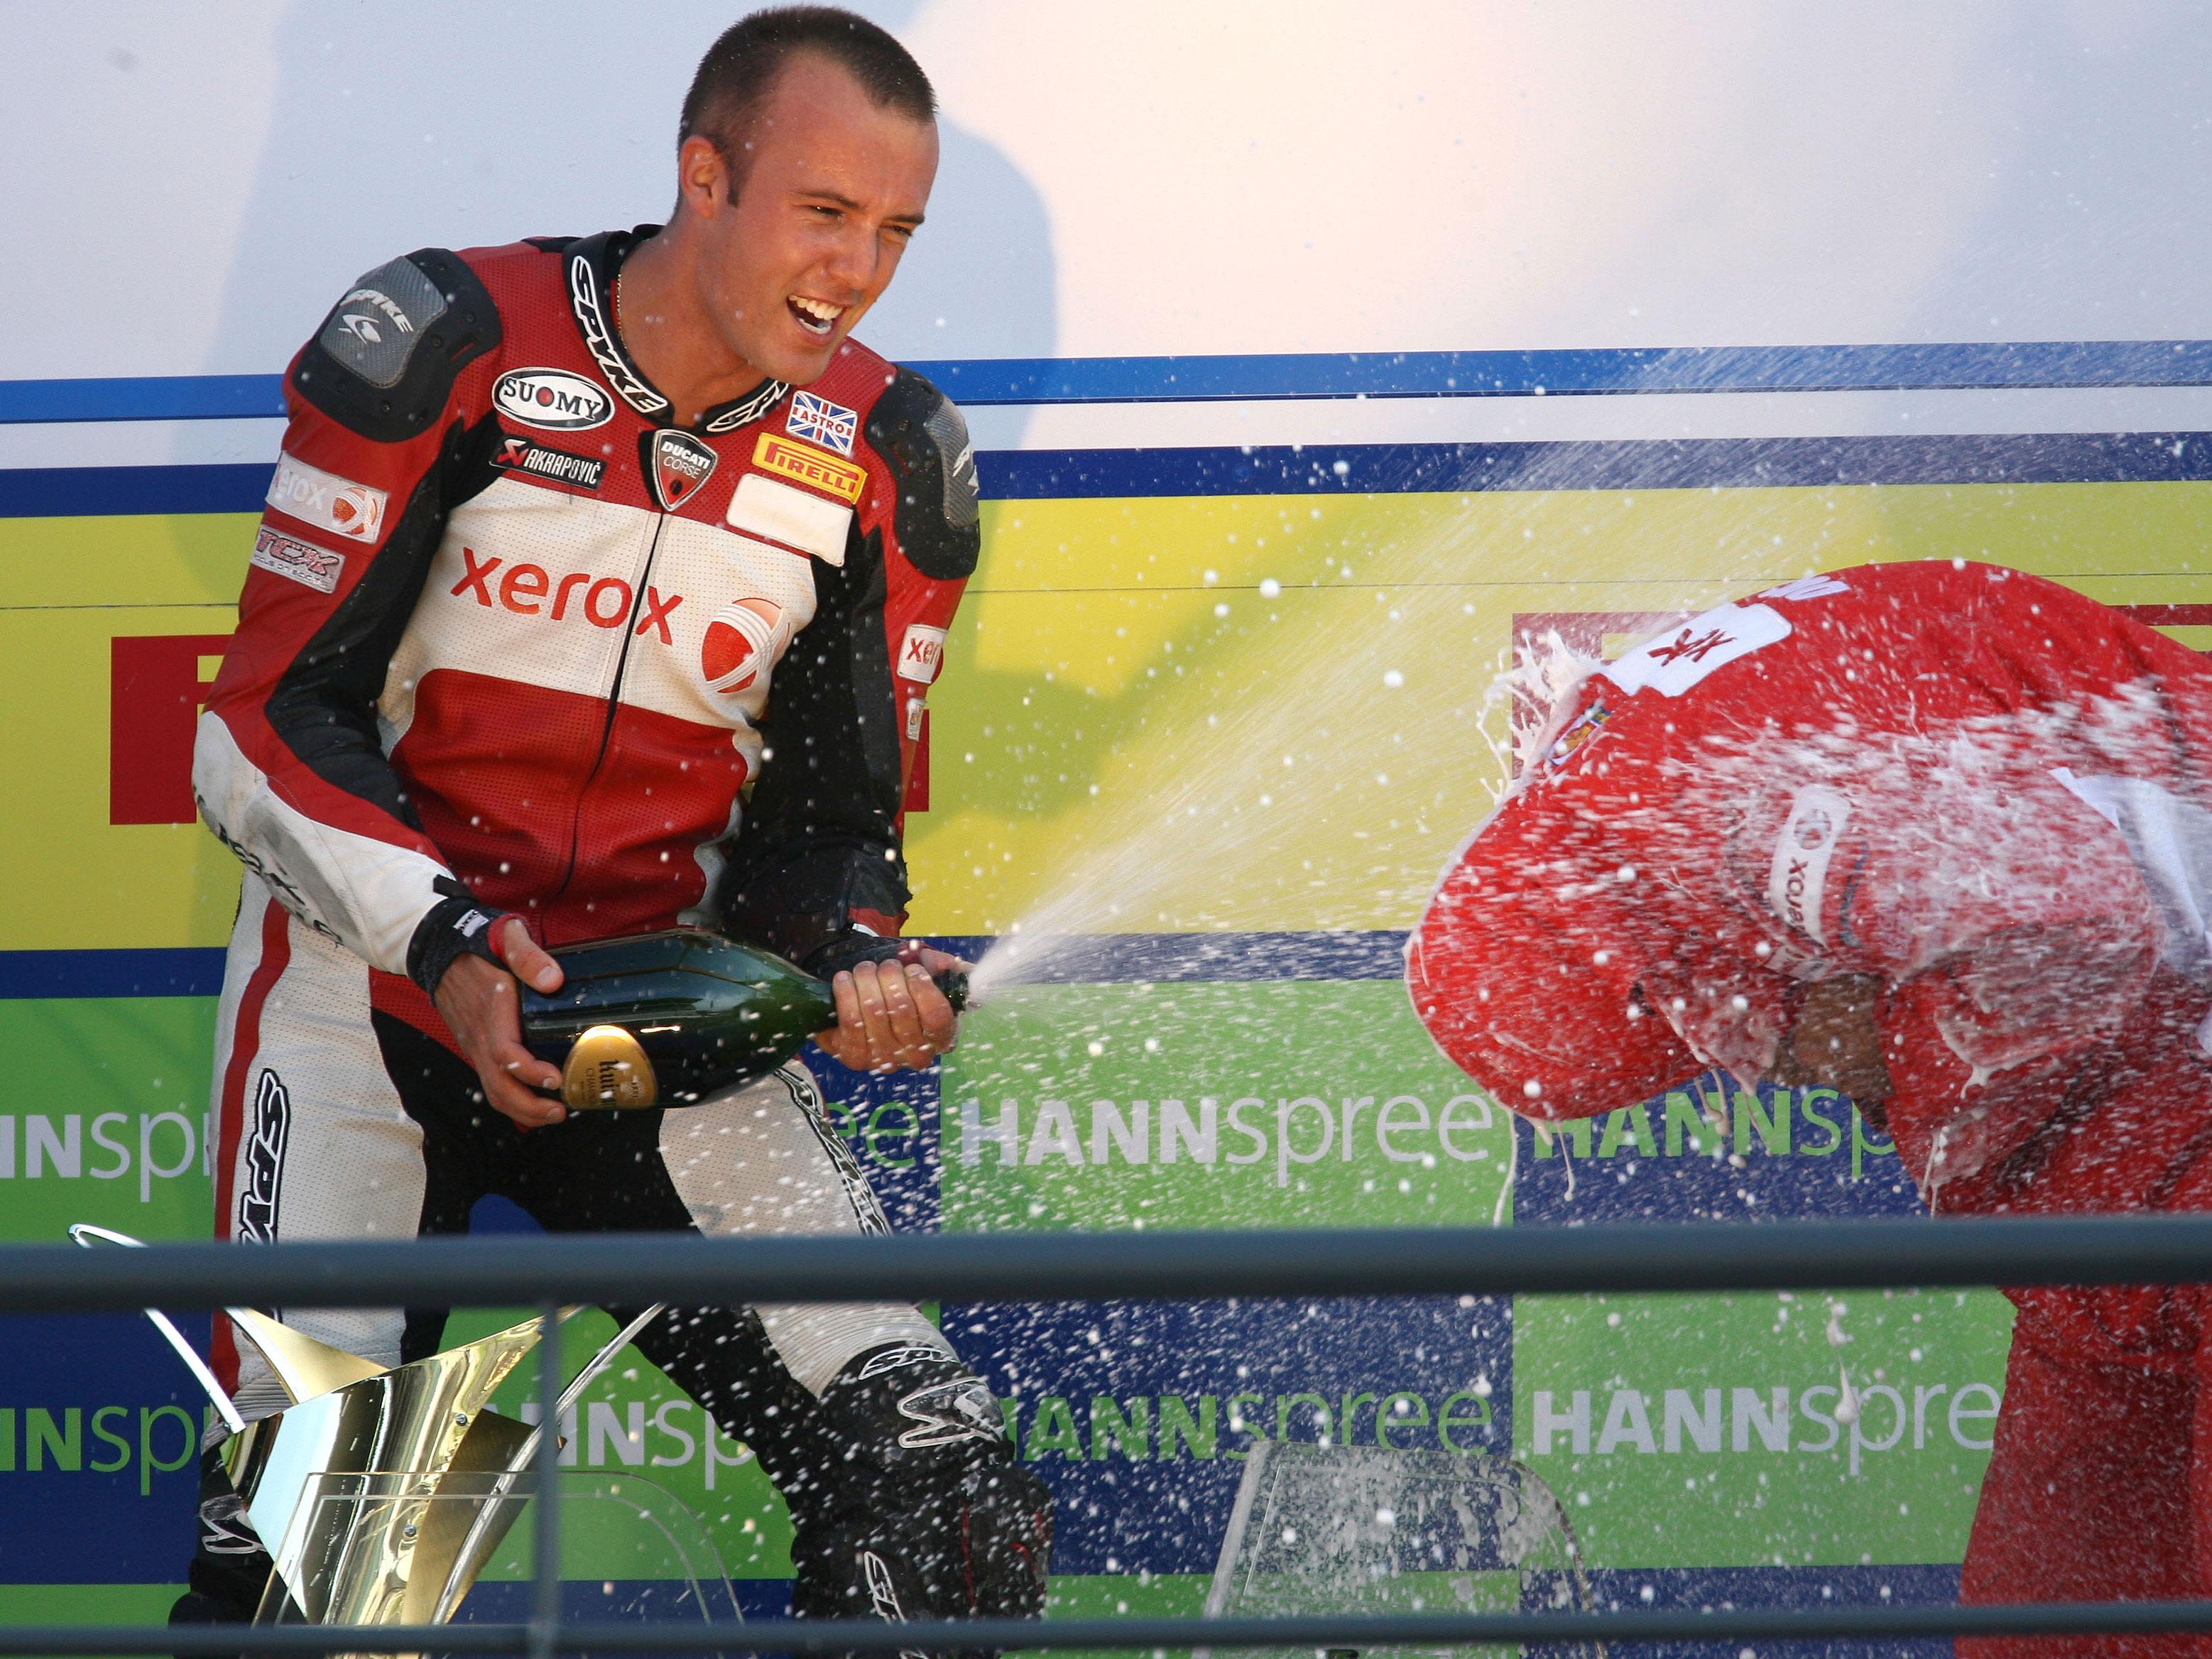 Imagen de Galeria de Roberts (Ducati), campeón de Superstock 1000